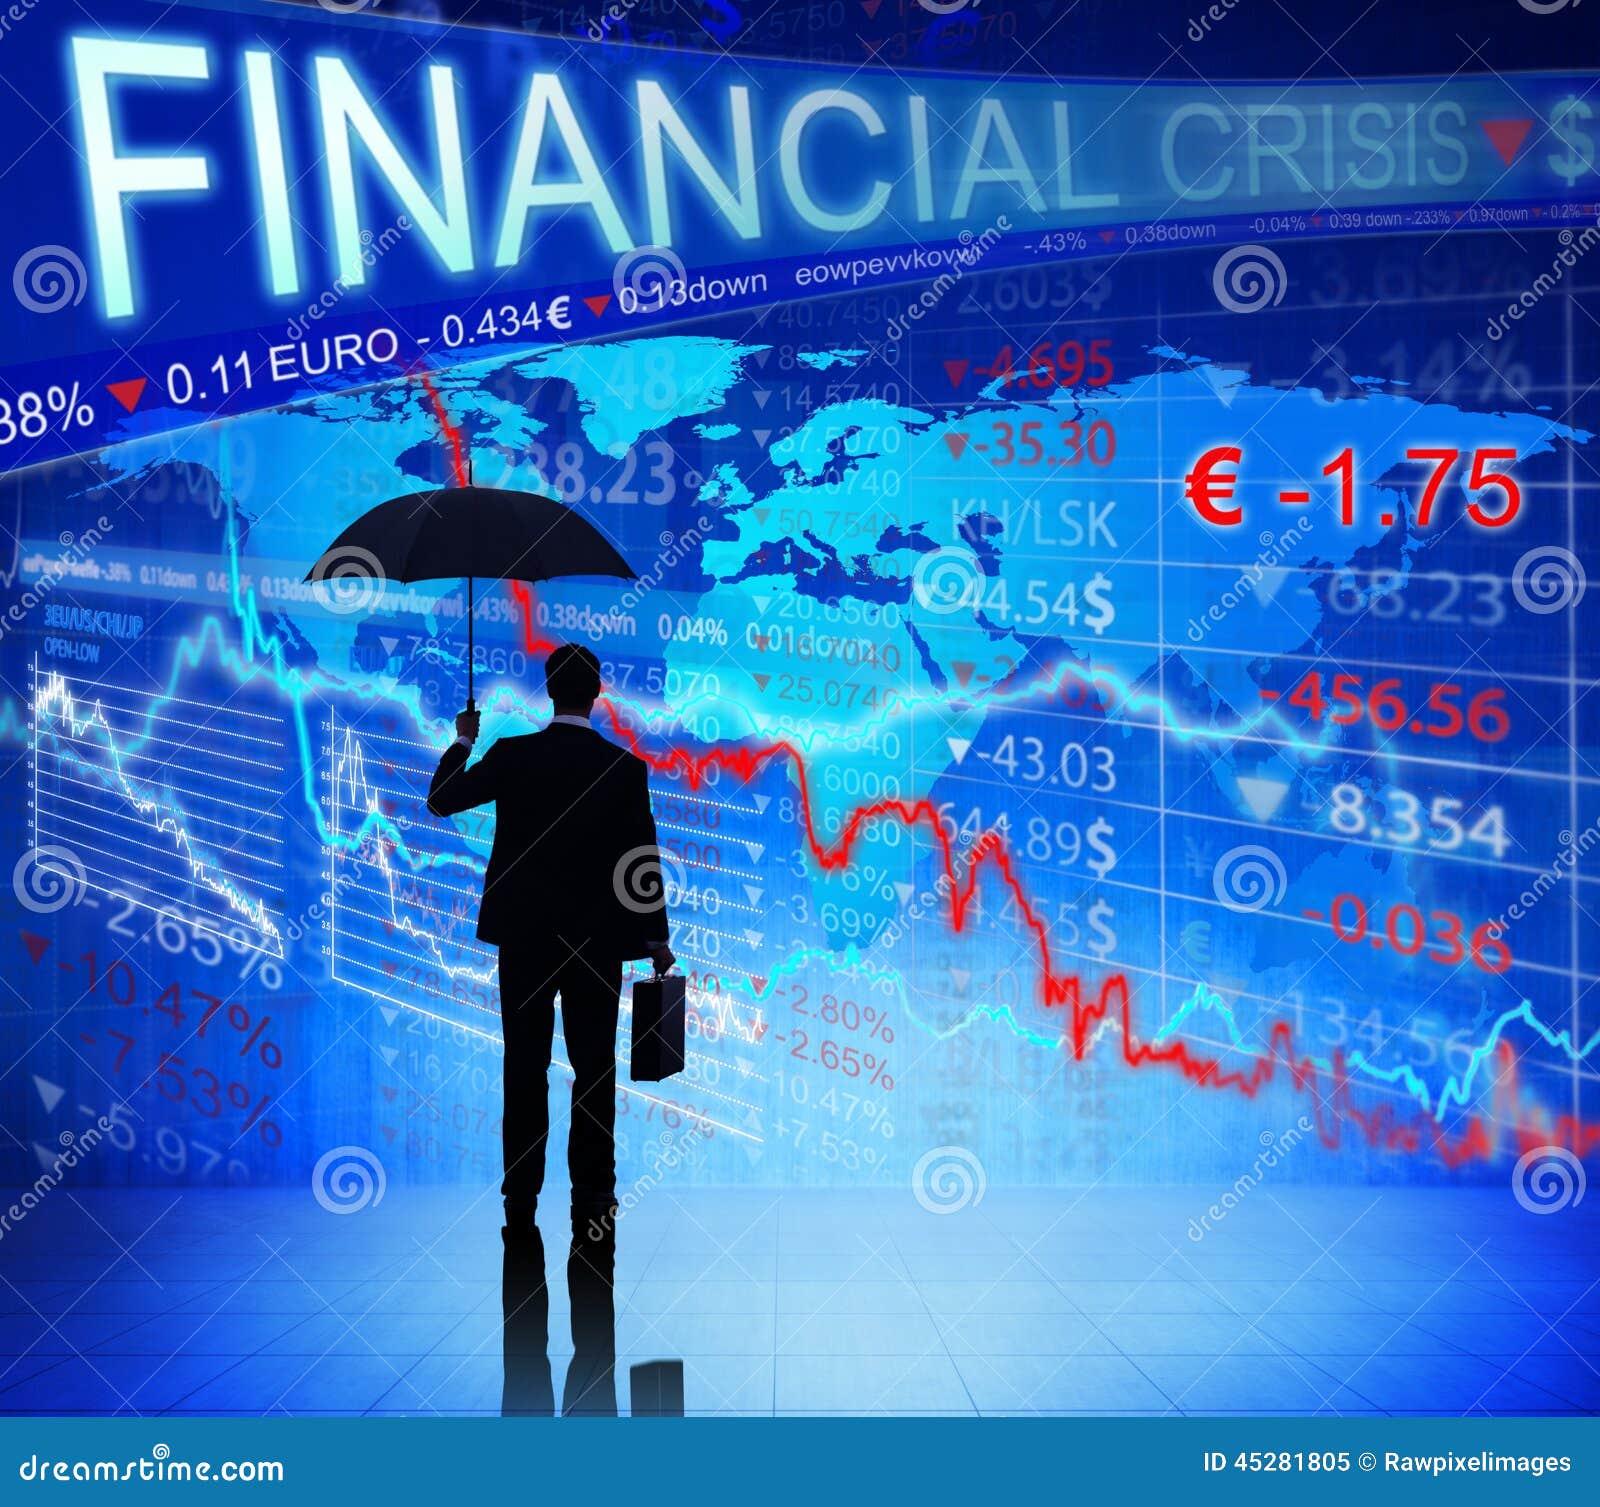 Businessman on Blue Financial Crisis Chart